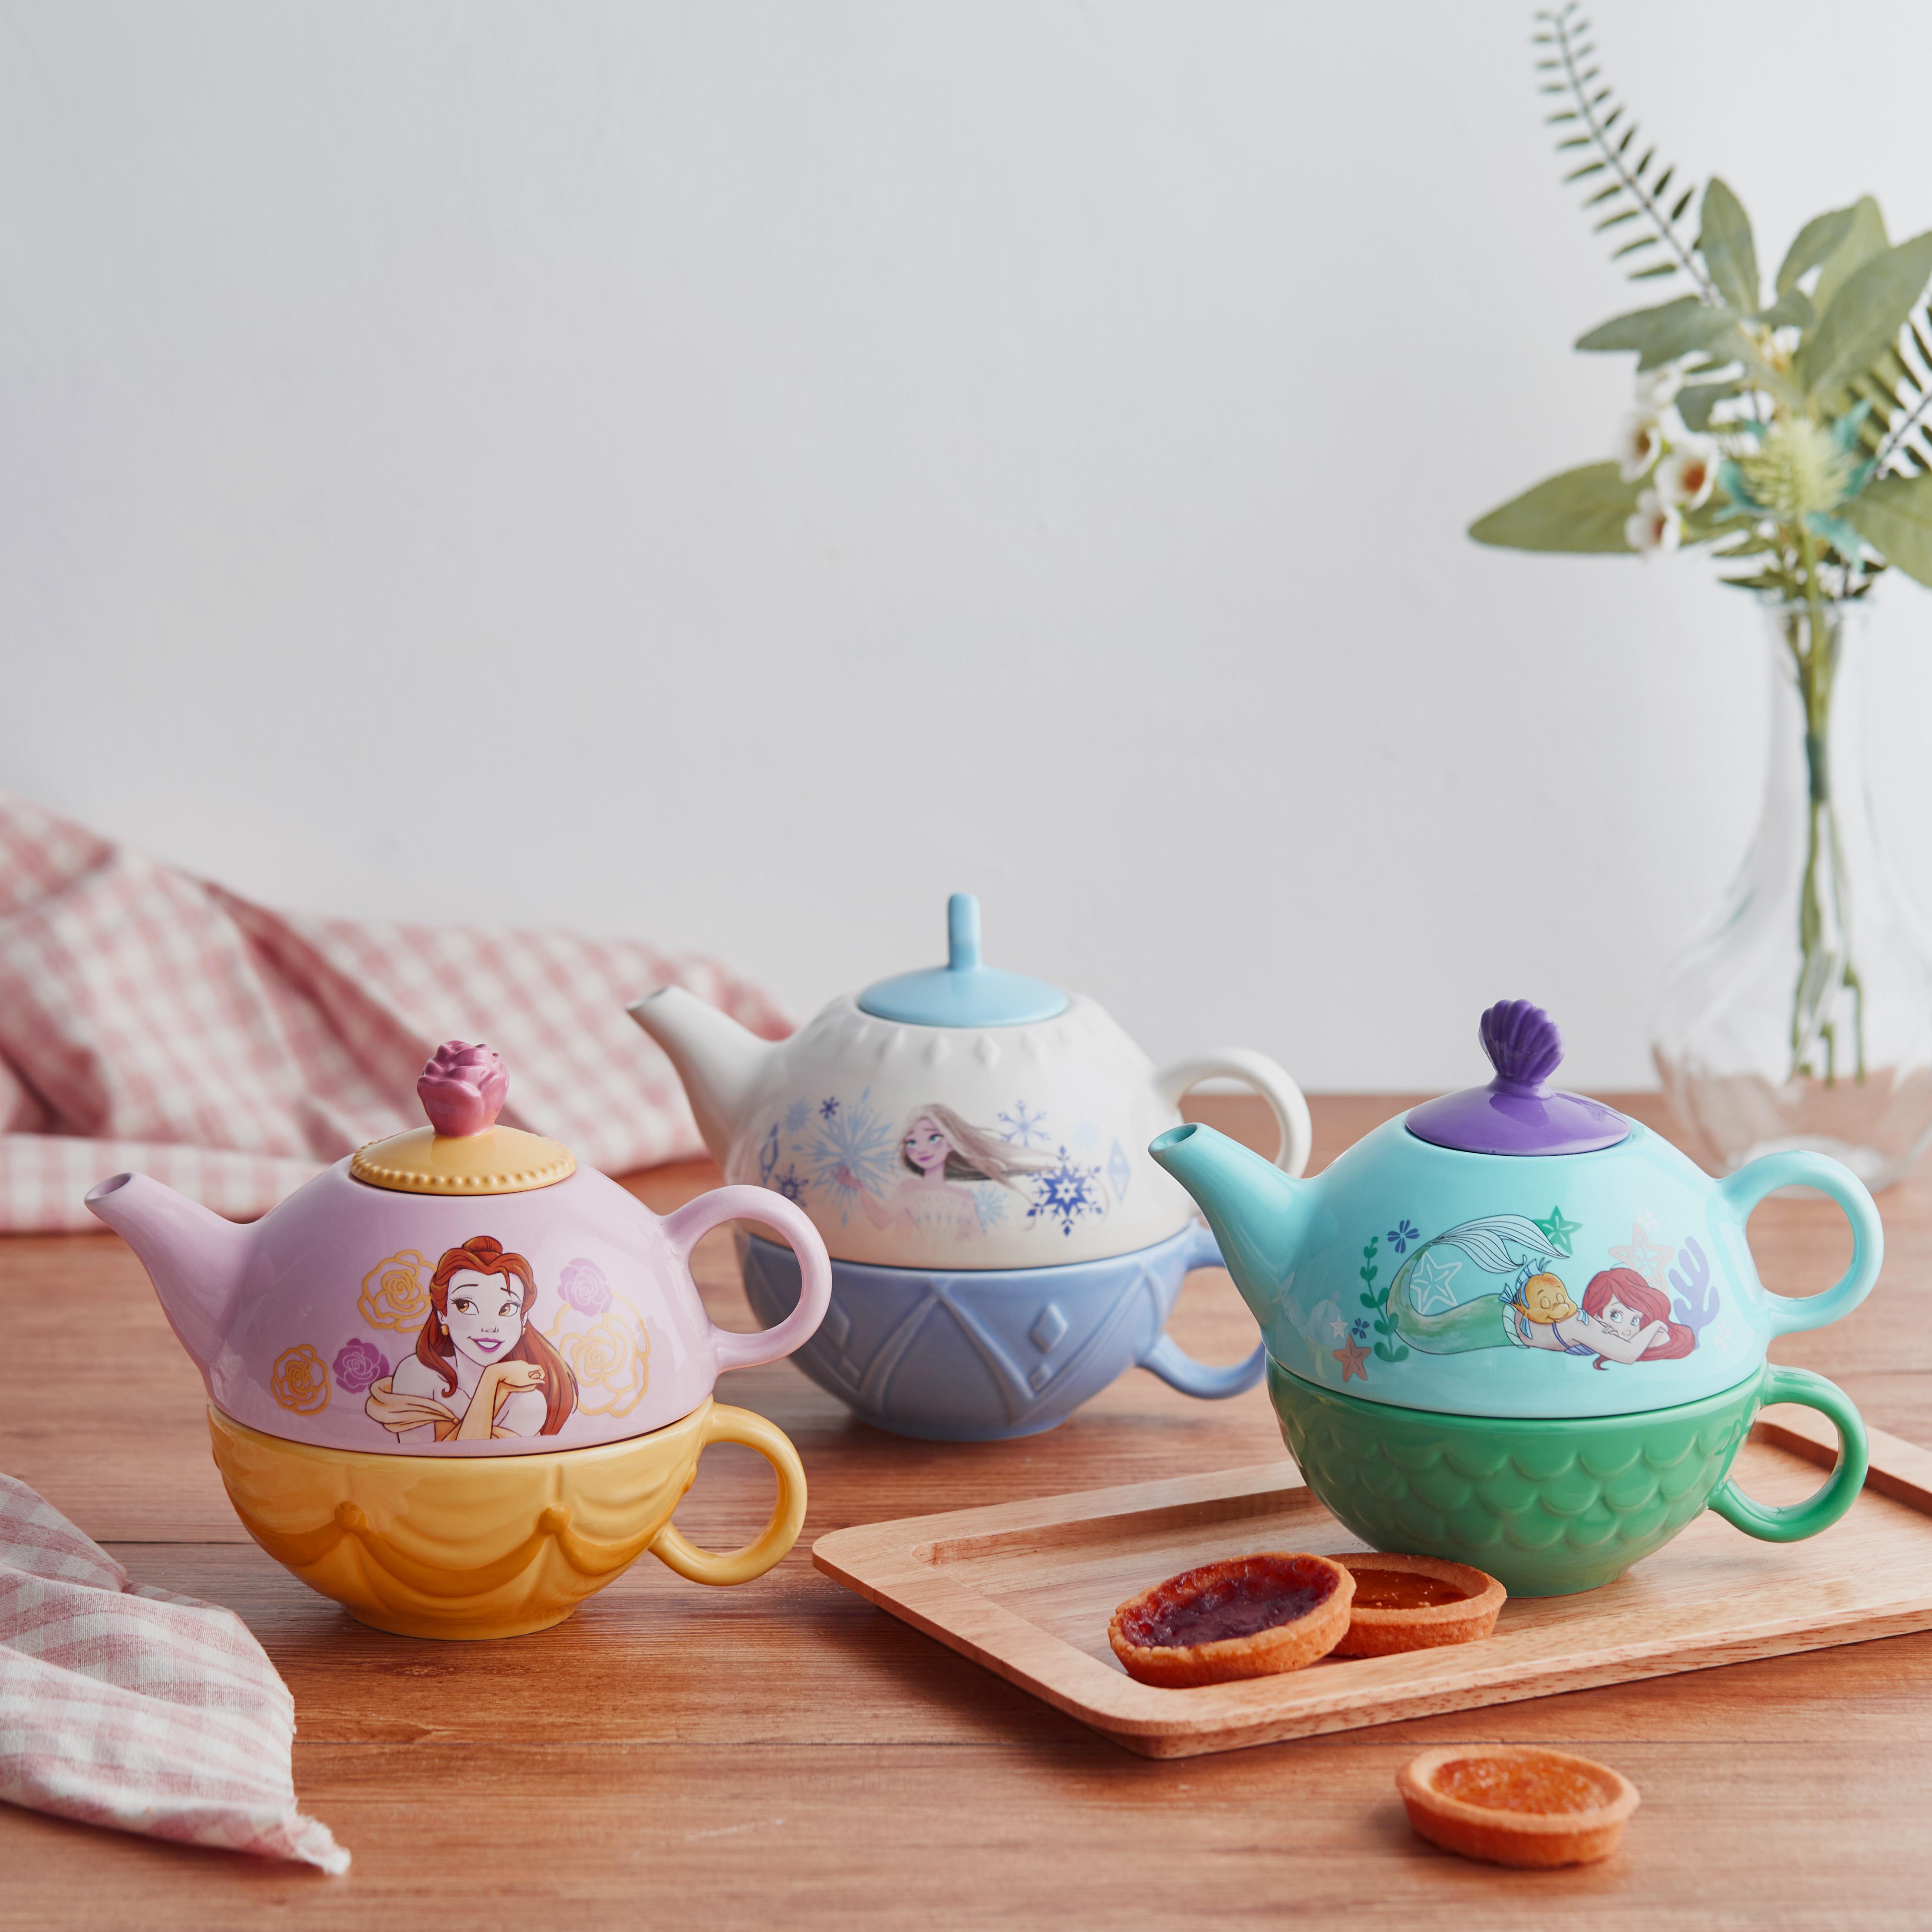 Disney The Little Mermaid Sculpted Ceramic Tea Set, Princess Ariel, 4-piece set slideshow image 7